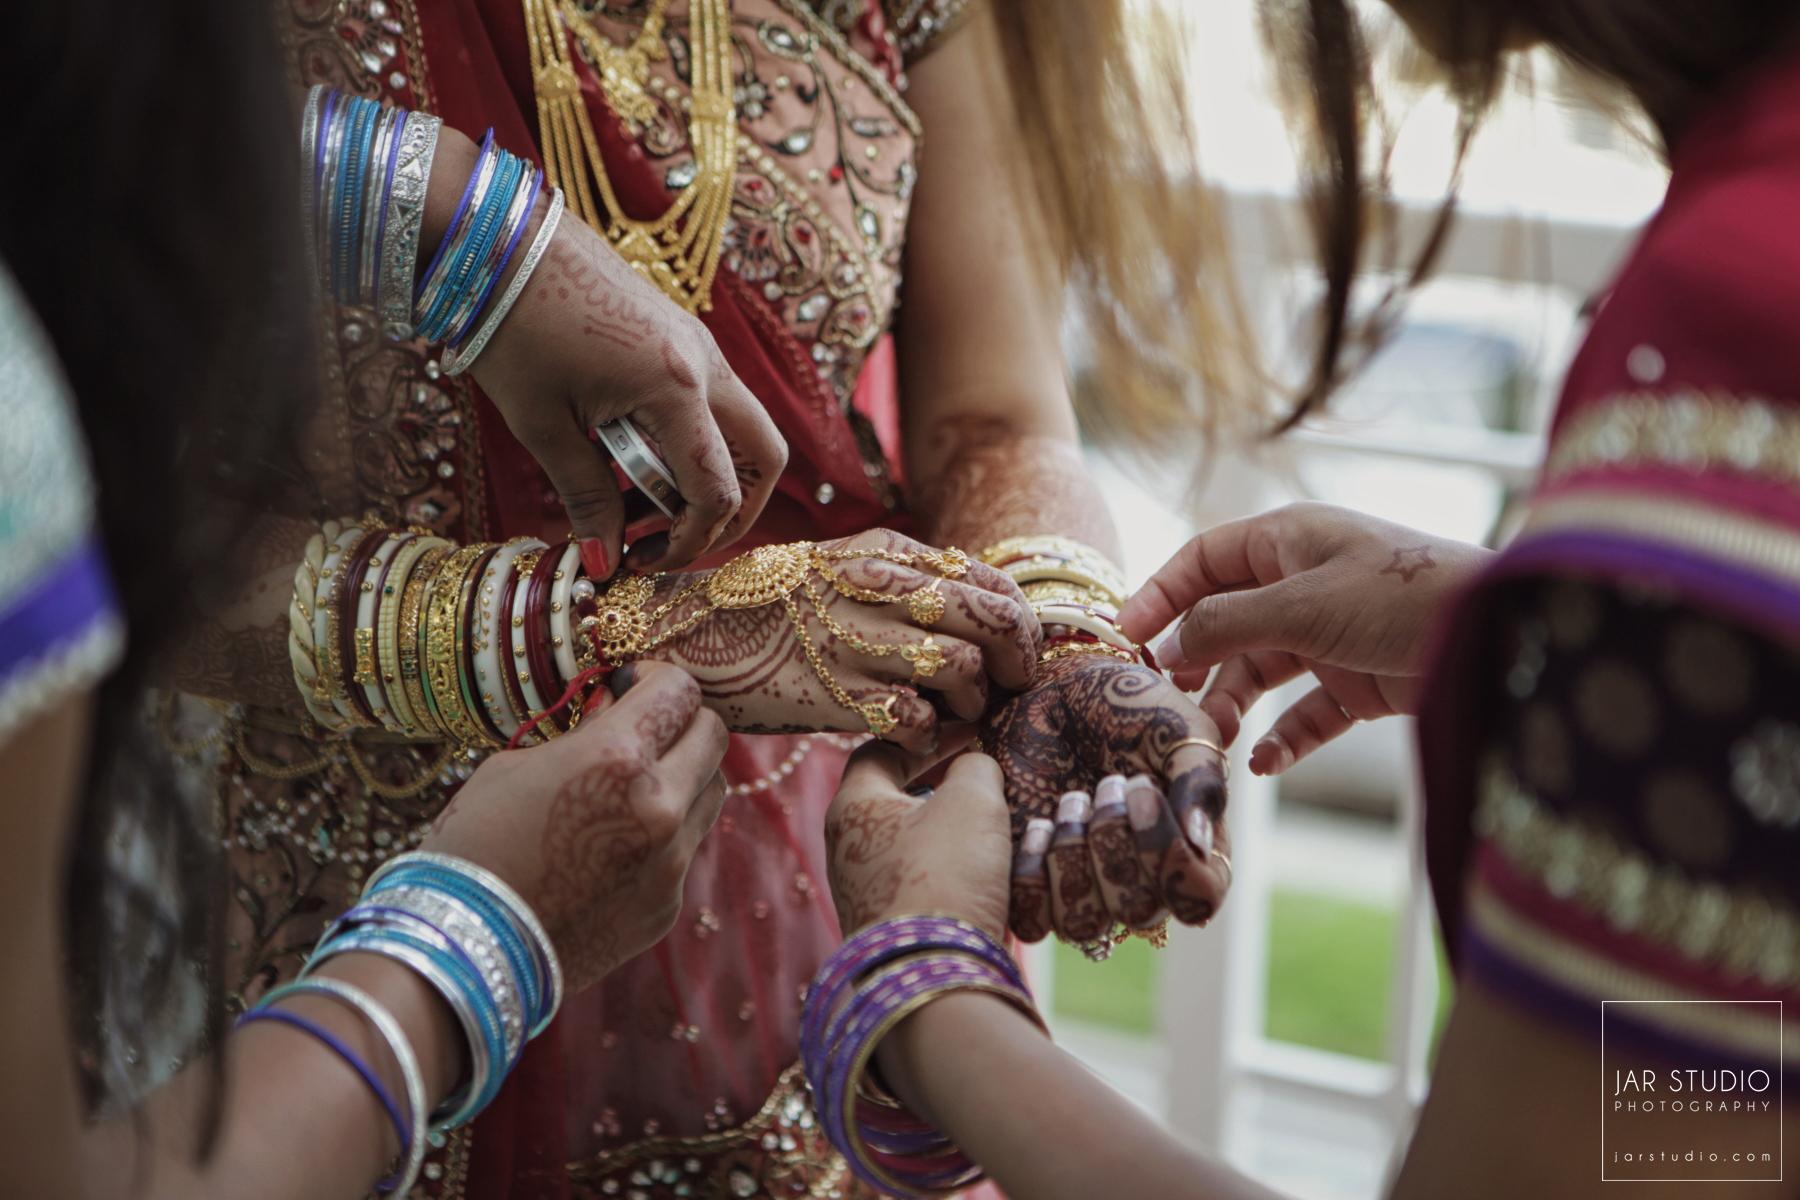 13-indian-pre-wedding-photography-jarstudio-tampa-fl.JPG